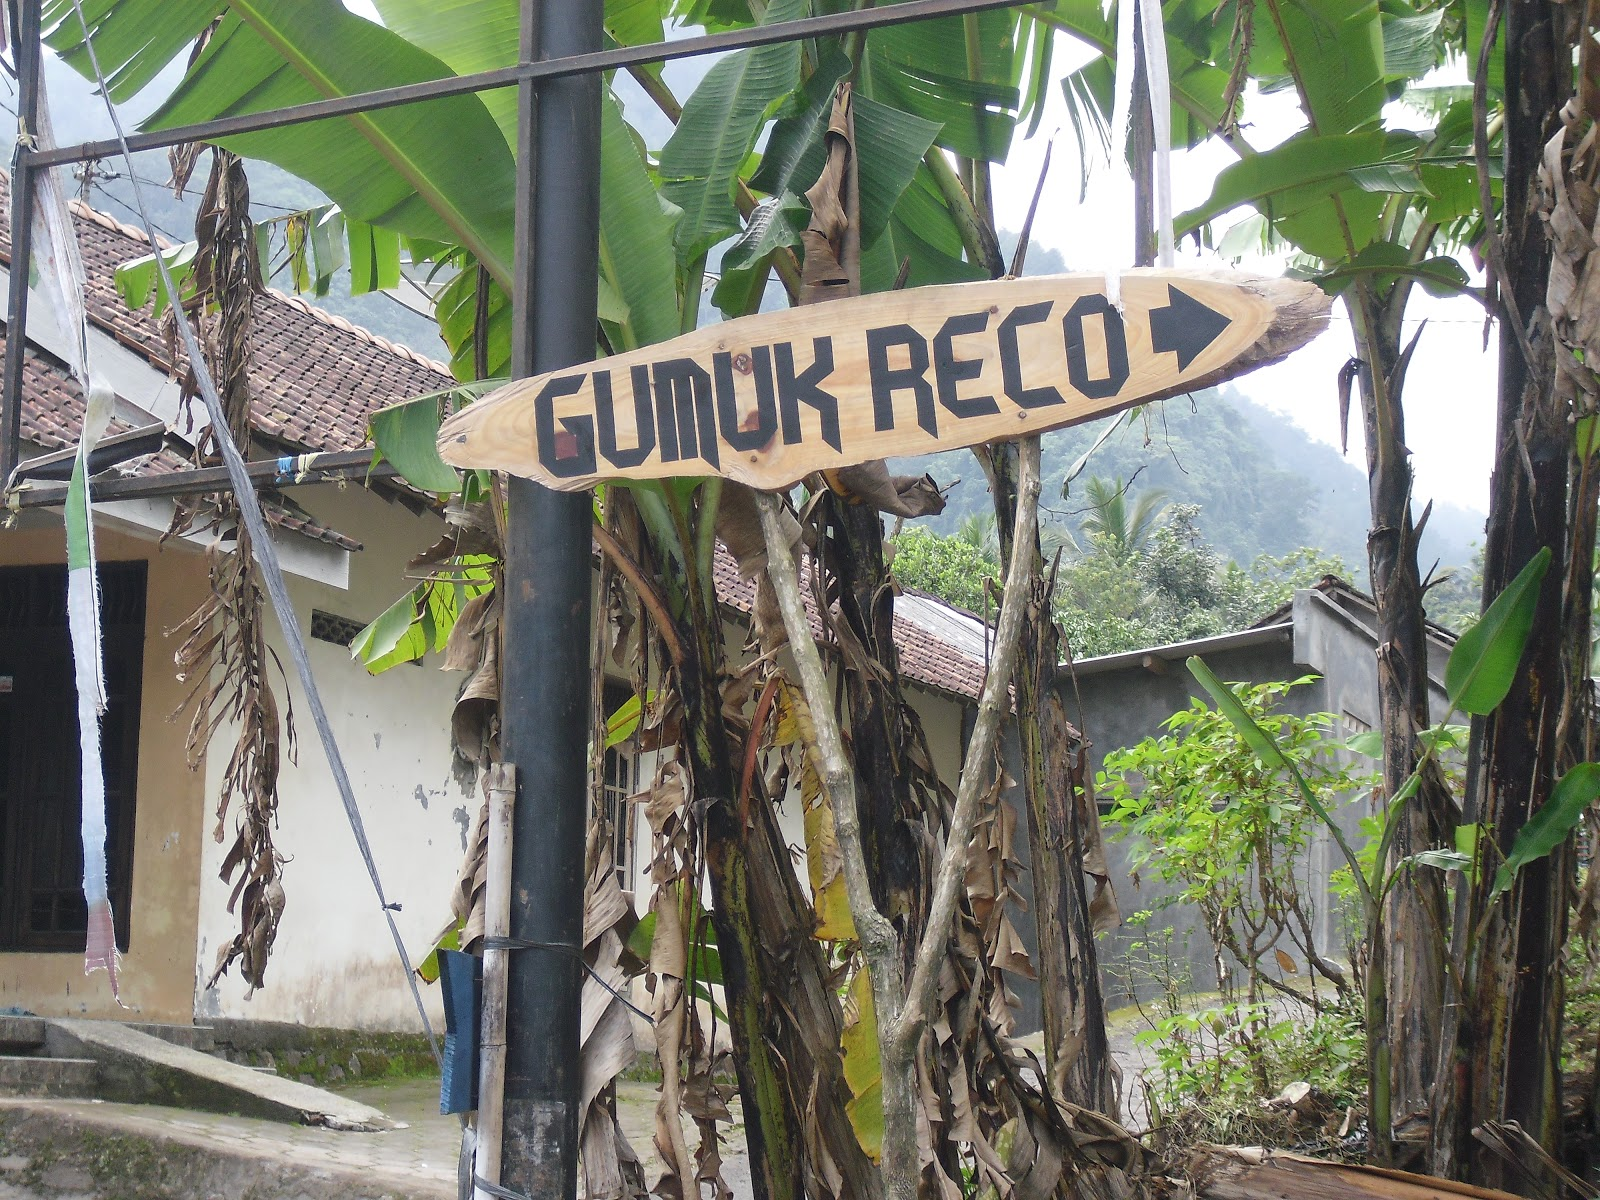 Wisata Gumuk Reco Banyubiru Kabupaten Semarang Iyoth World Pura Giri